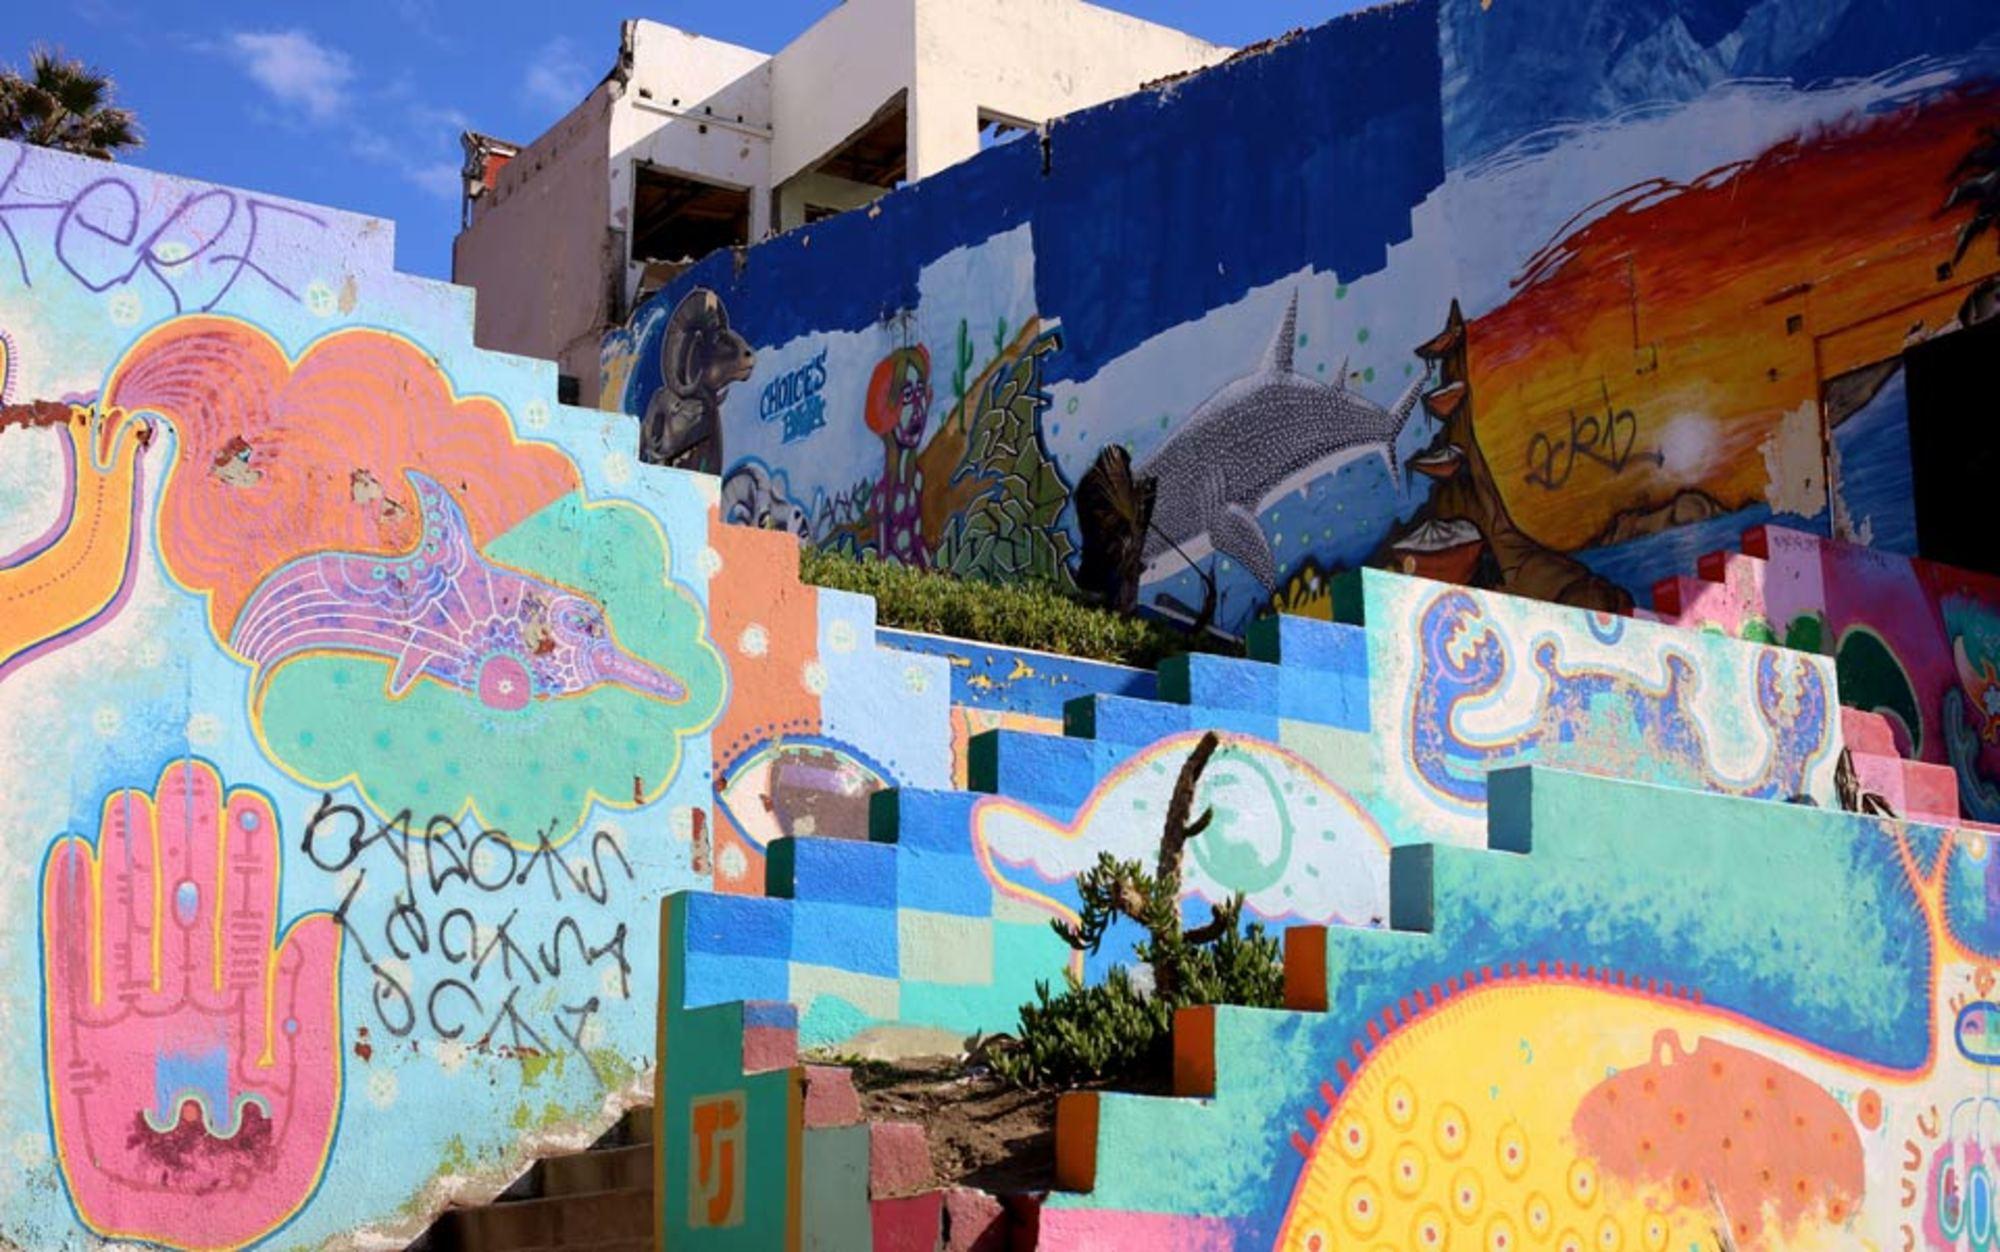 Header boardwalk murals